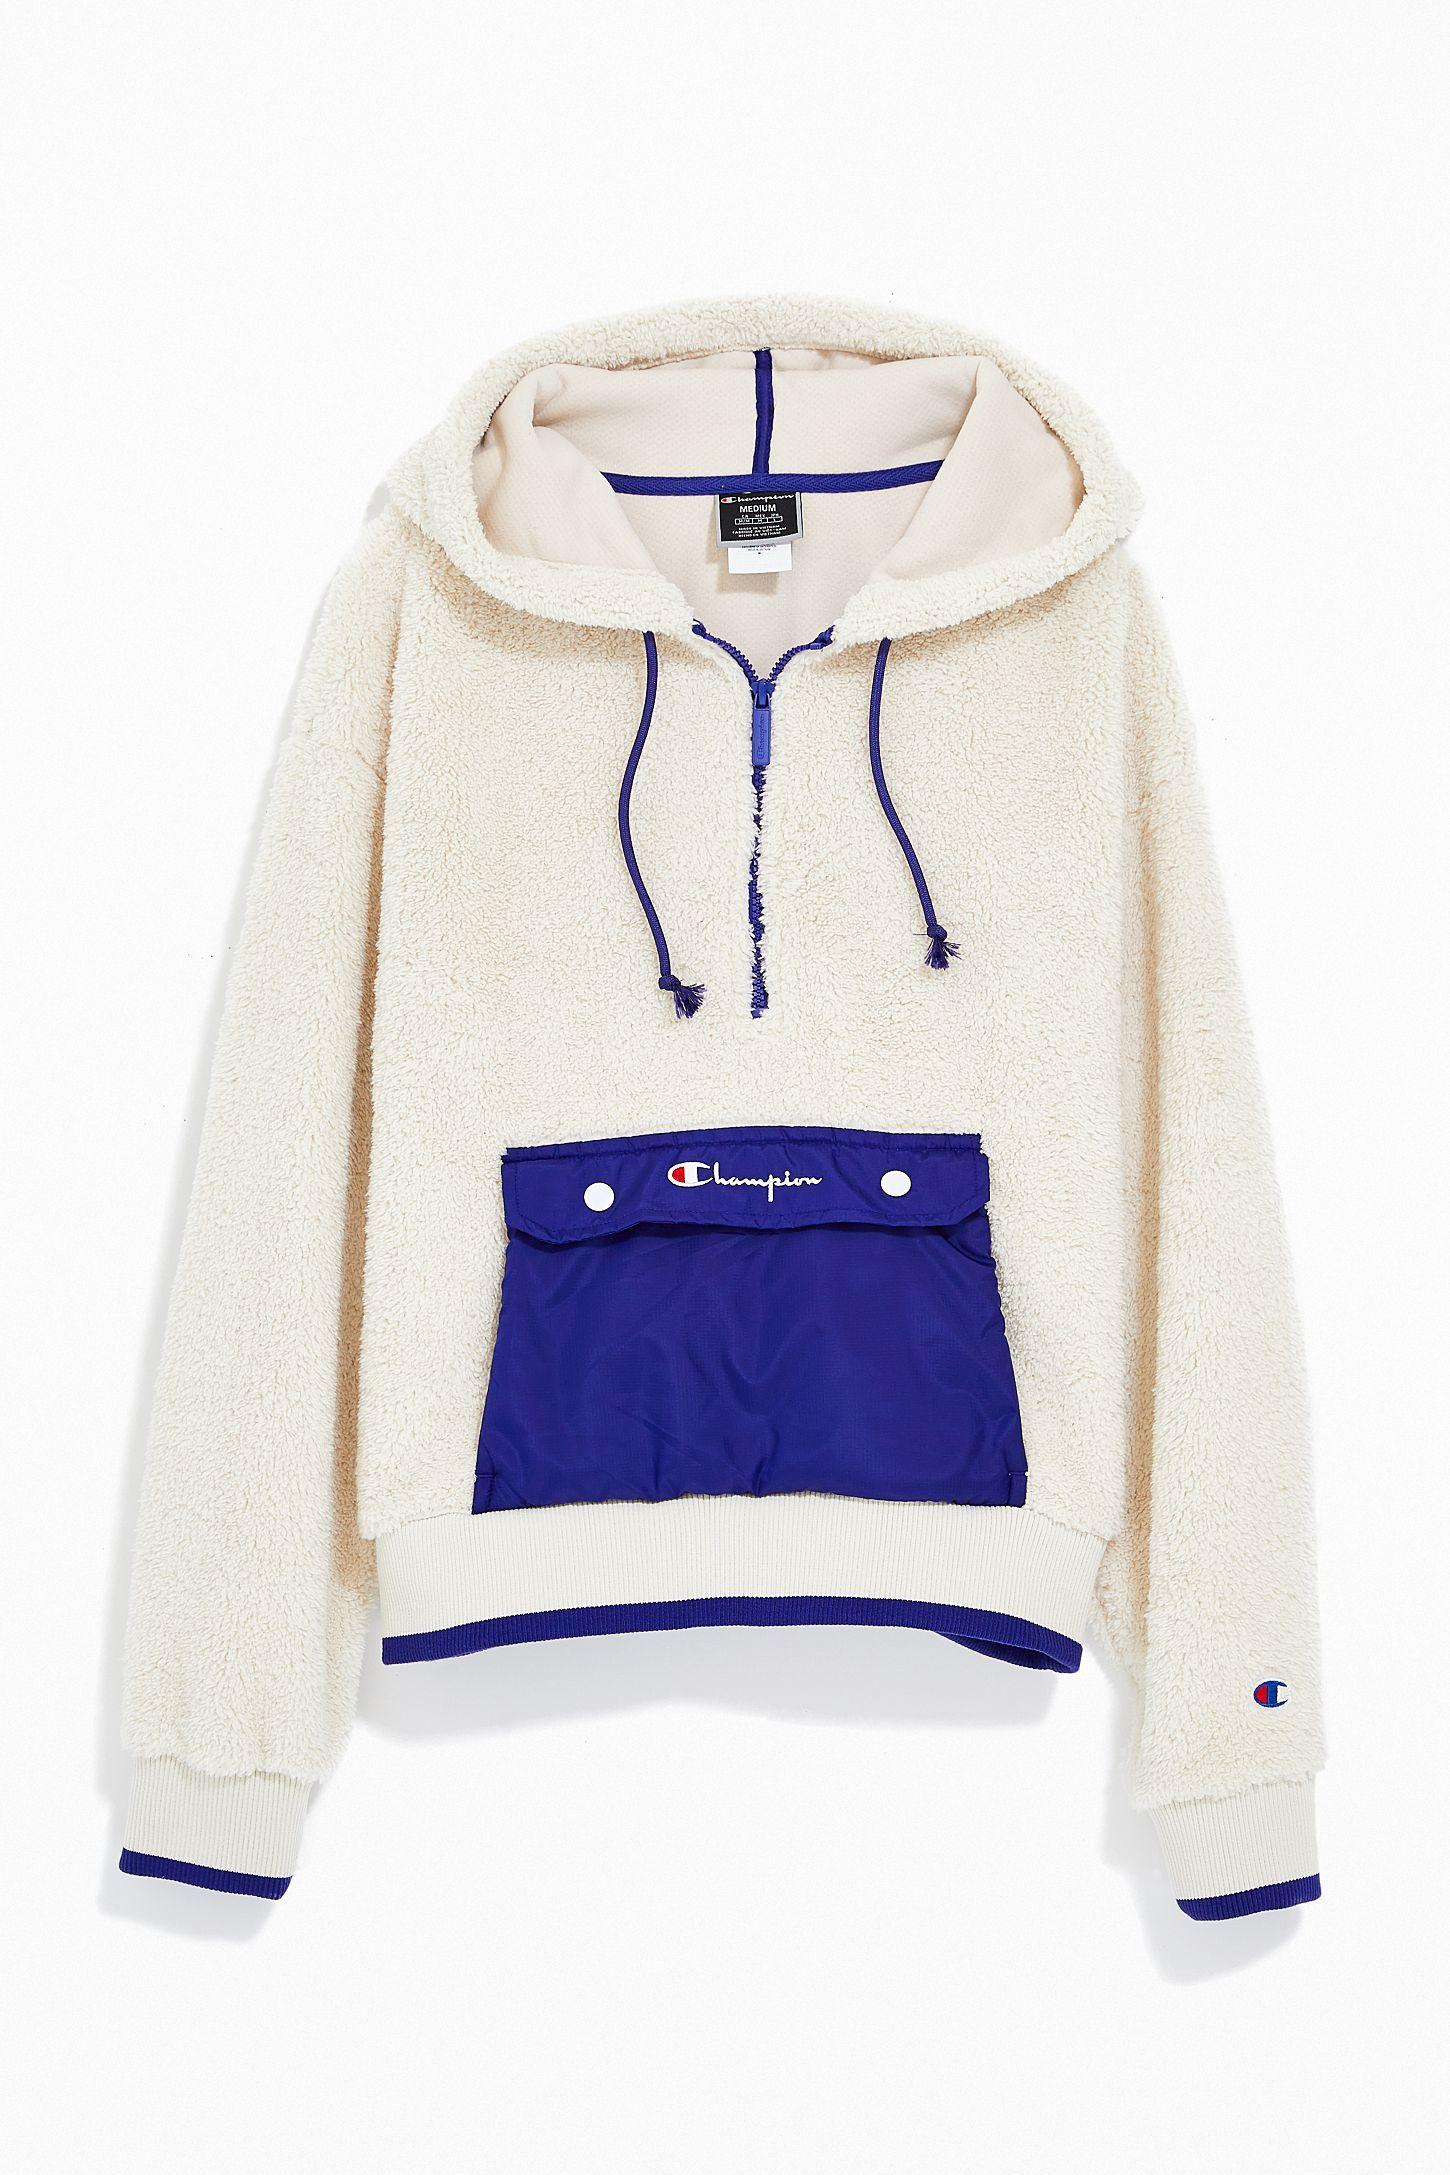 Champion Uo Exclusive Sherpa Half Zip Sweatshirt Urban Outfitters Half Zip Sweatshirt Nike Fleece Jacket Comfortable Fall Outfits [ 2175 x 1450 Pixel ]